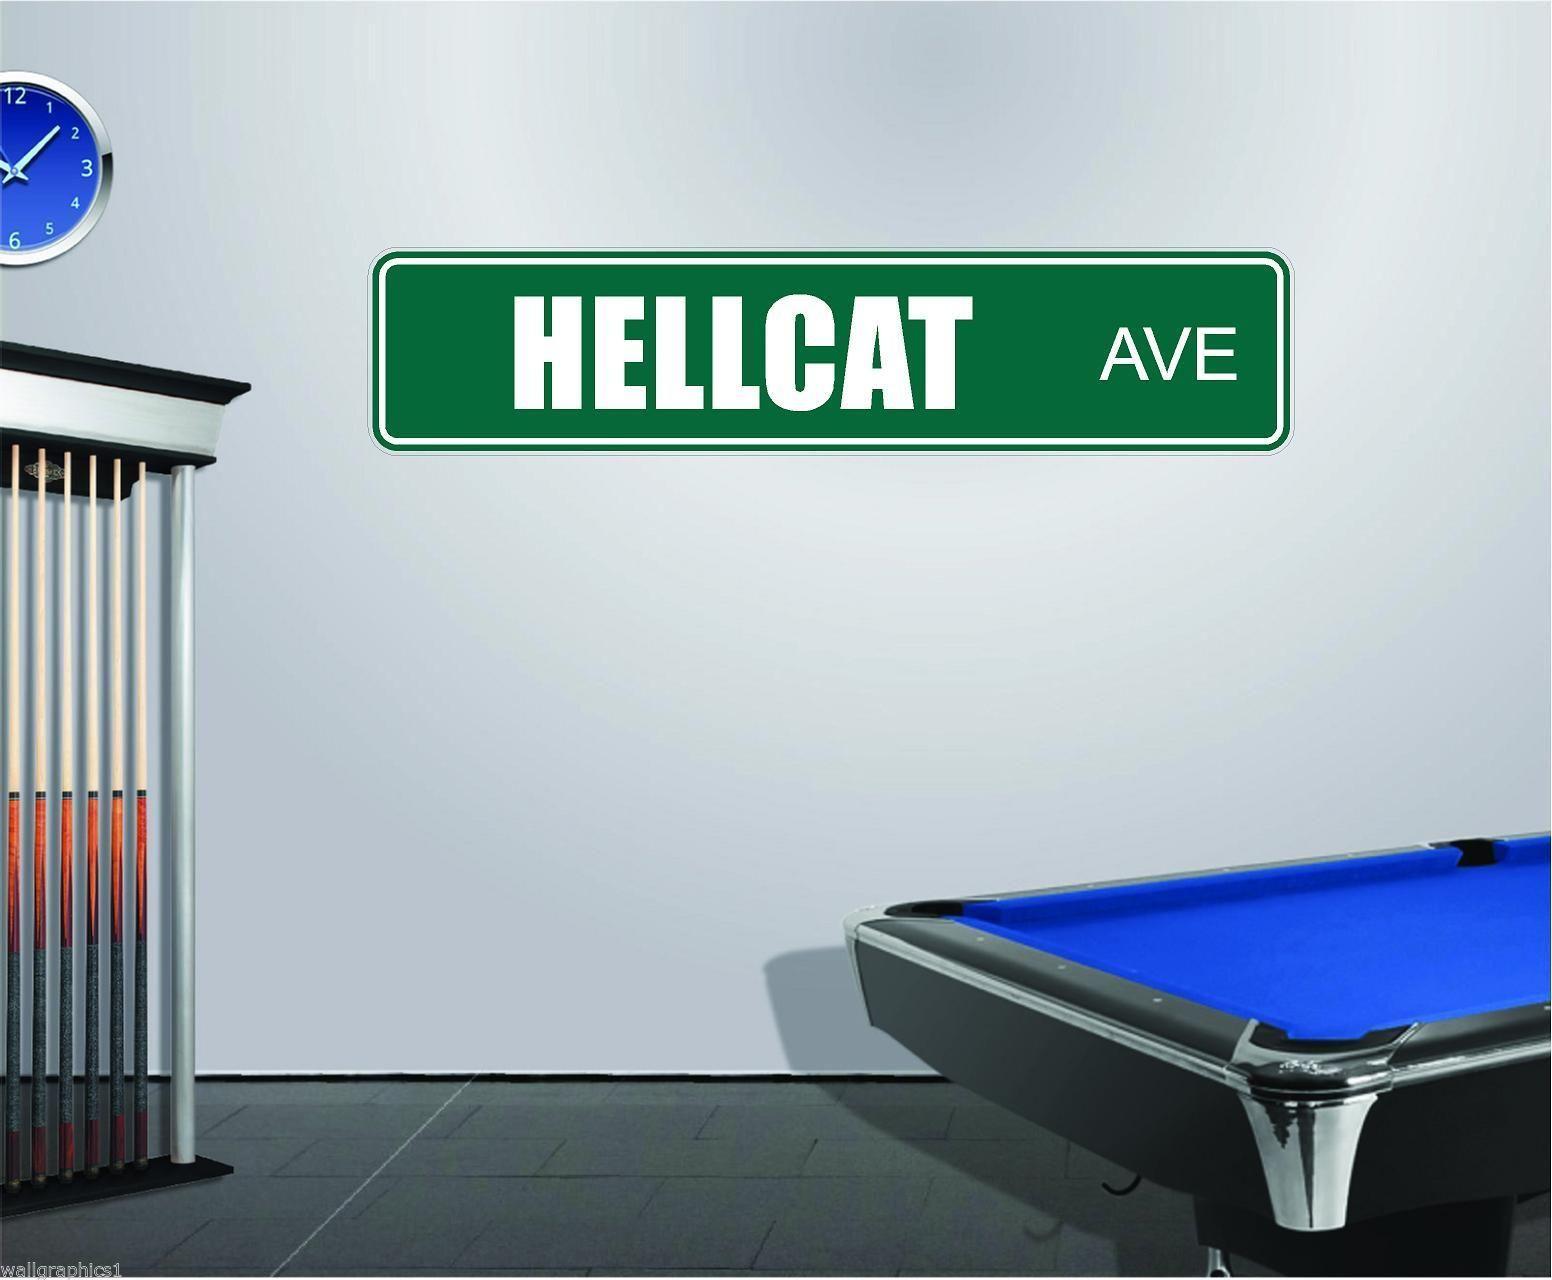 Garage Wall Decal Sticker Graphic HELLCAT Ave Street Sign Dodge Challenger MOPAR